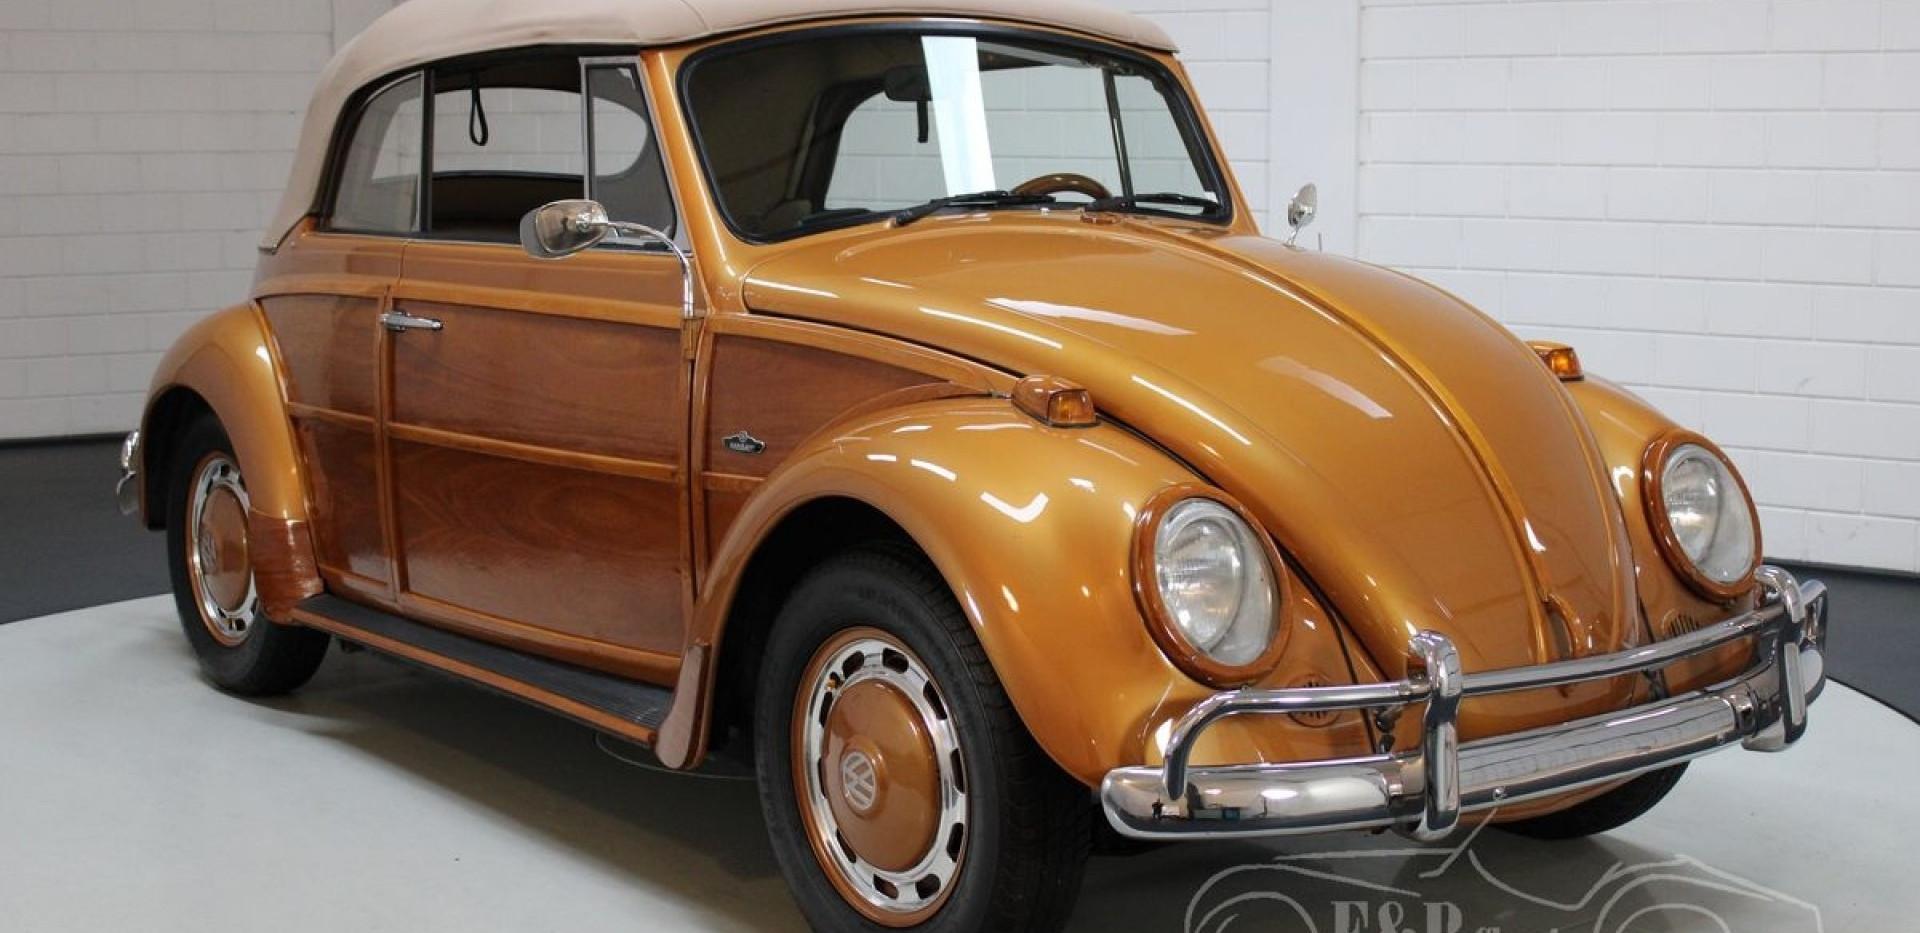 volkswagen-kever-woody-1966-v1273-055.jp